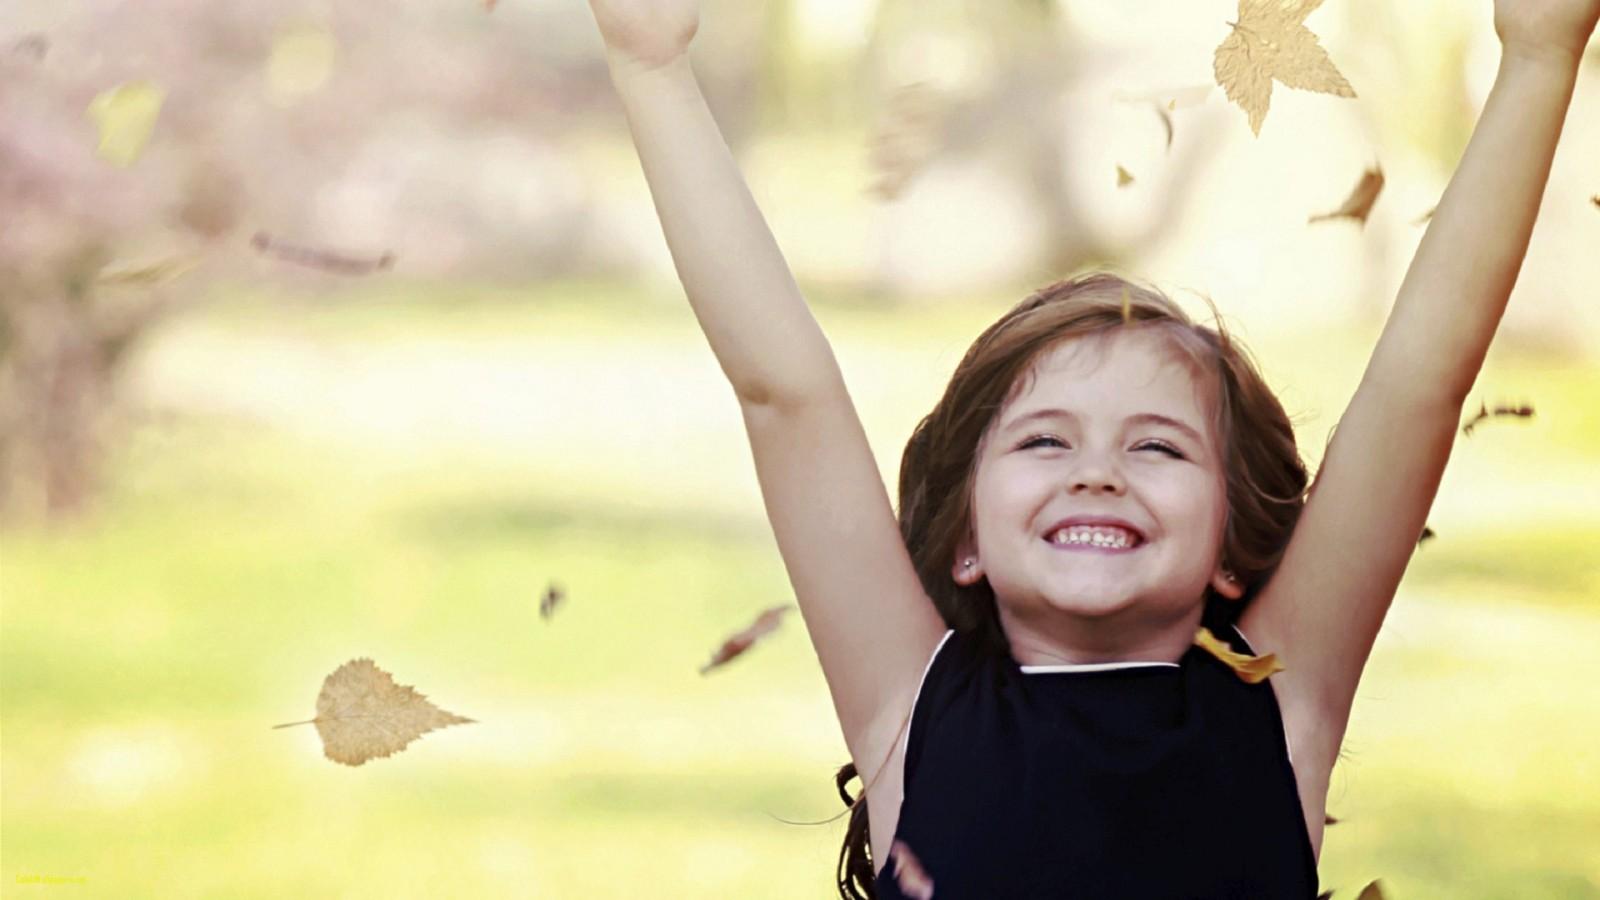 Indija: U škole uveden predmet o sreći